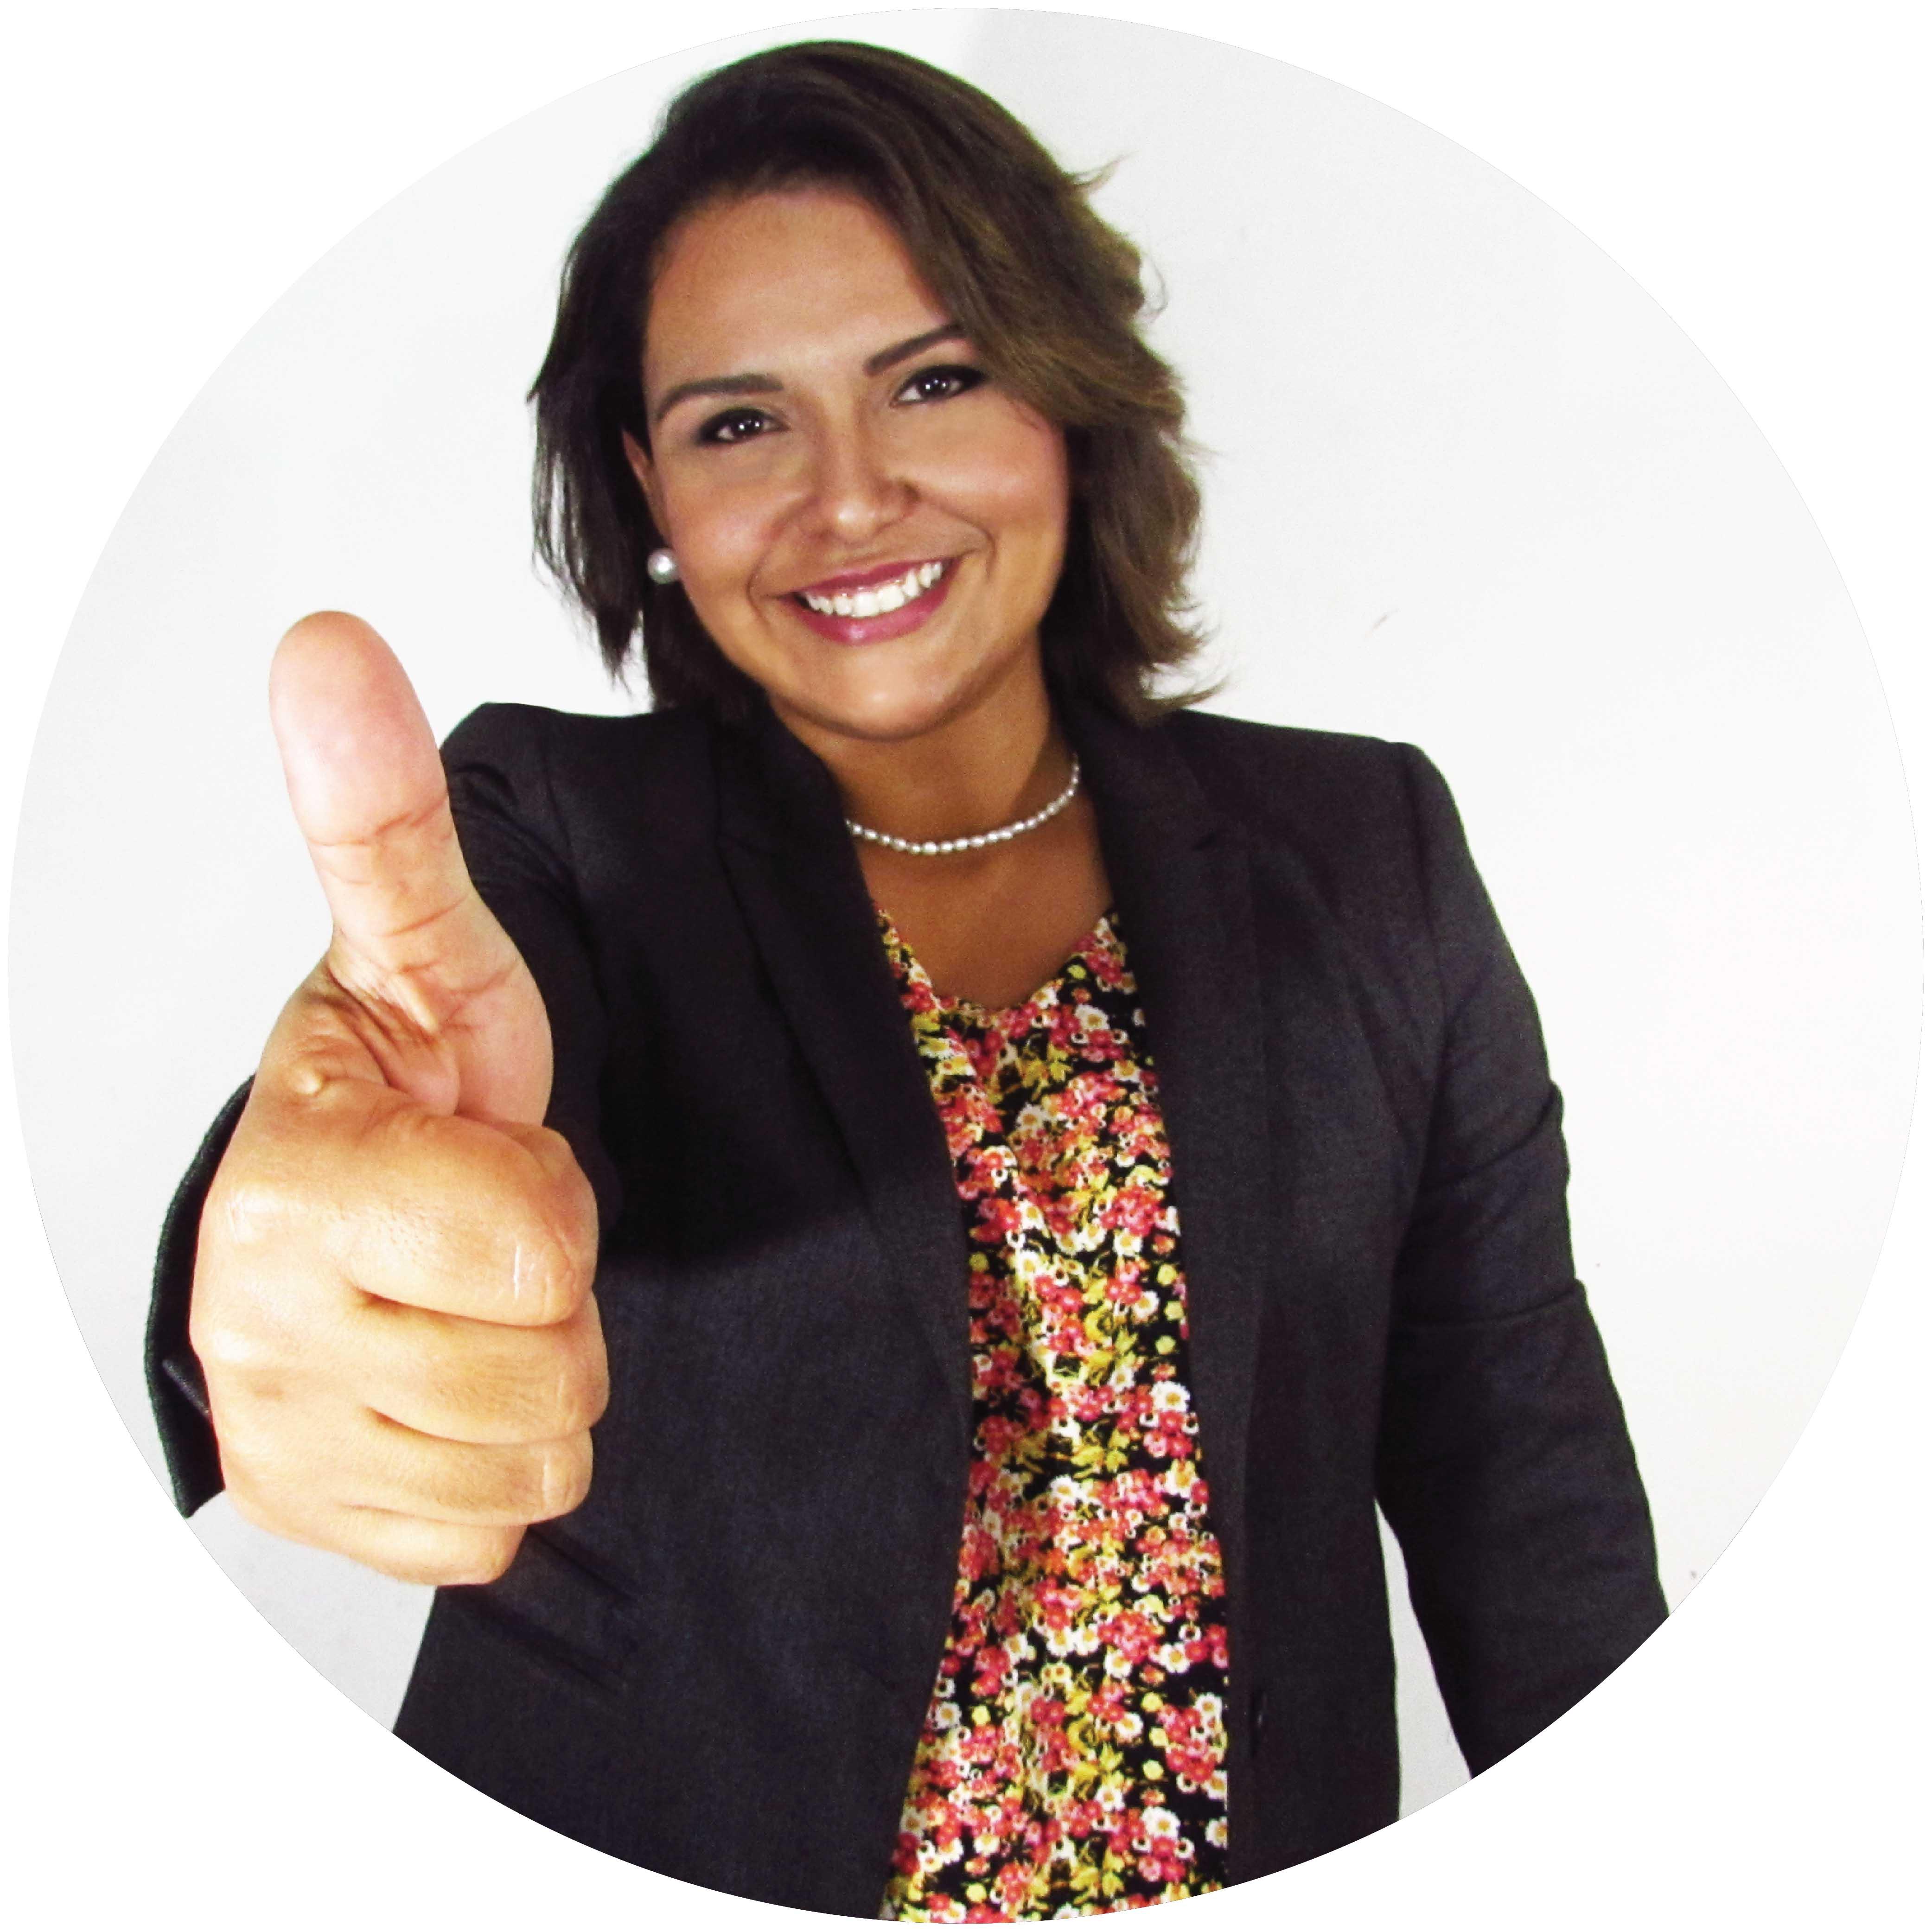 Vanessa Rodríguez (Venezuela)